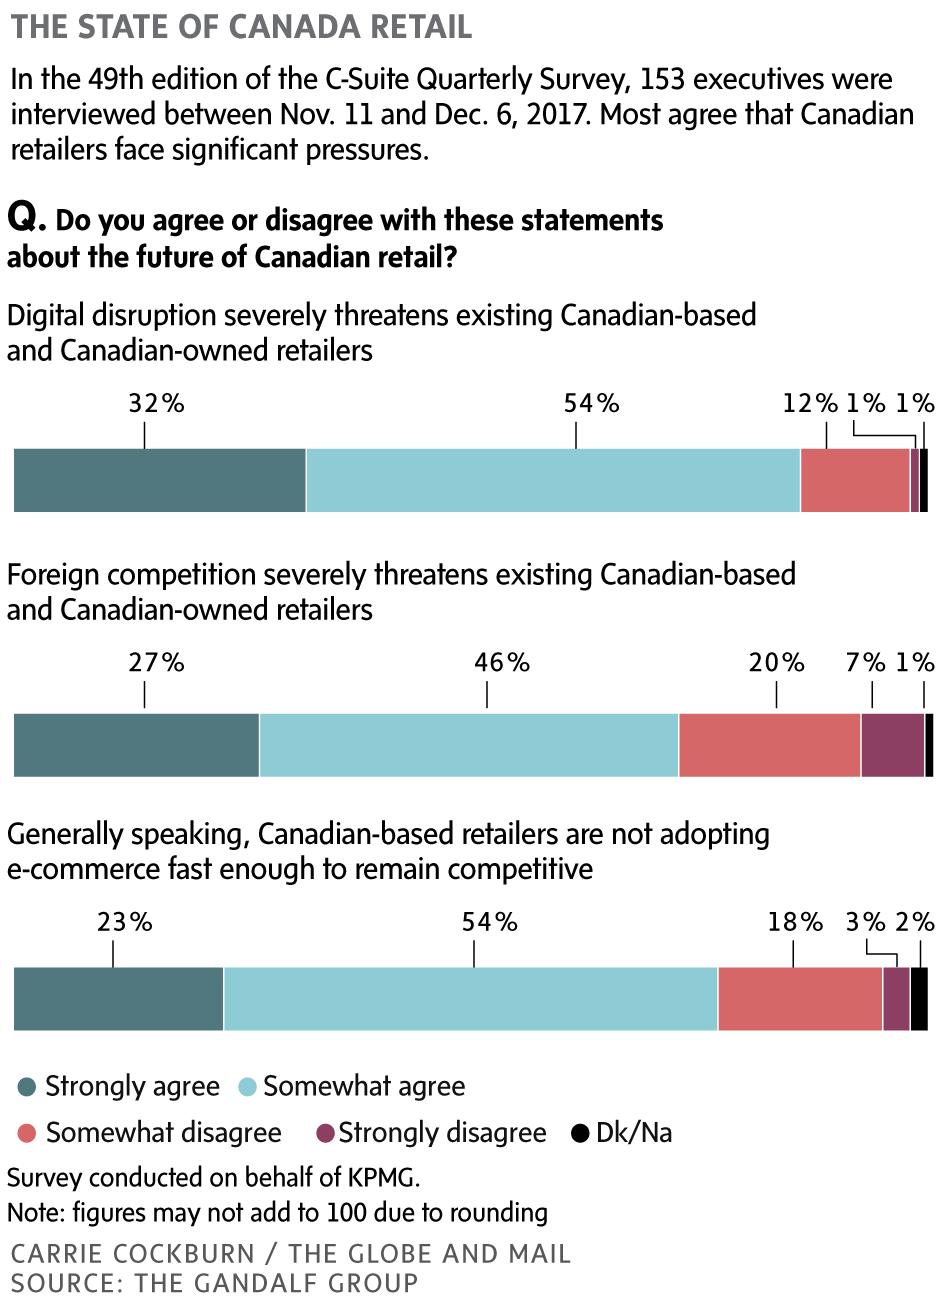 The key to Canada's retail success? Aggressive adoption of e